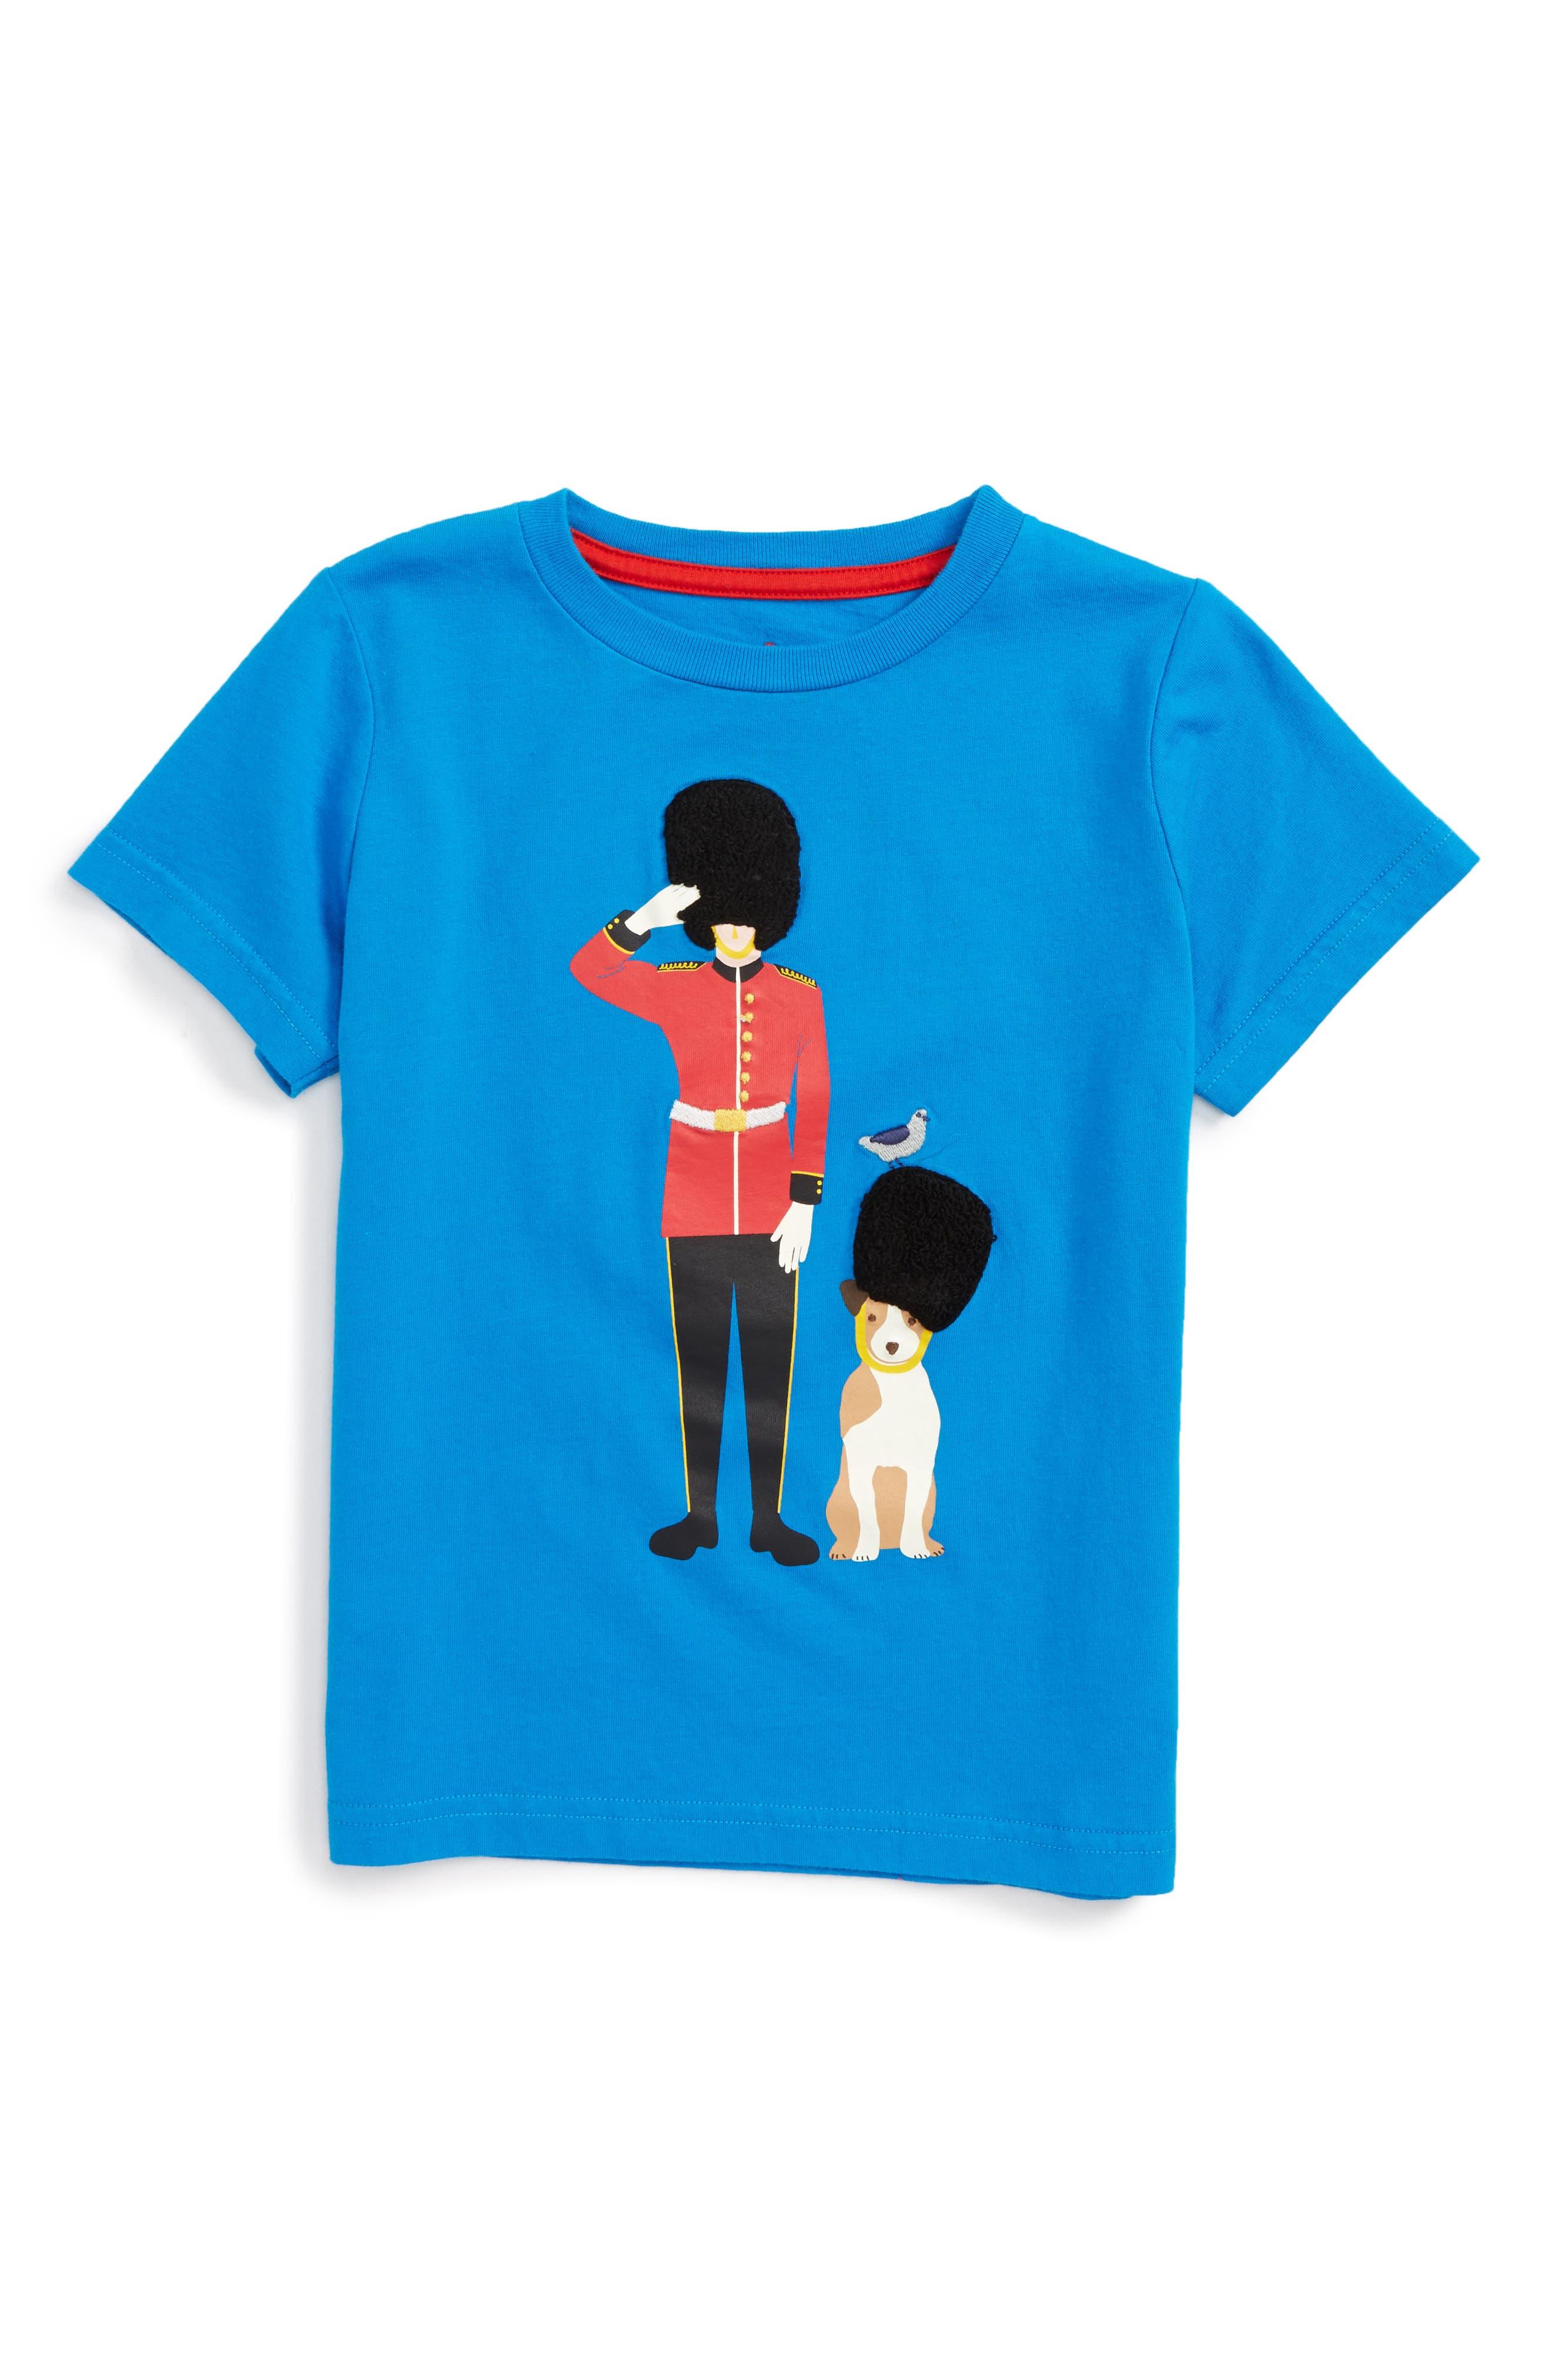 Alternate Image 1 Selected - Mini Boden Great British Guard Graphic T-Shirt (Toddler Boys, Little Boys & Big Boys)